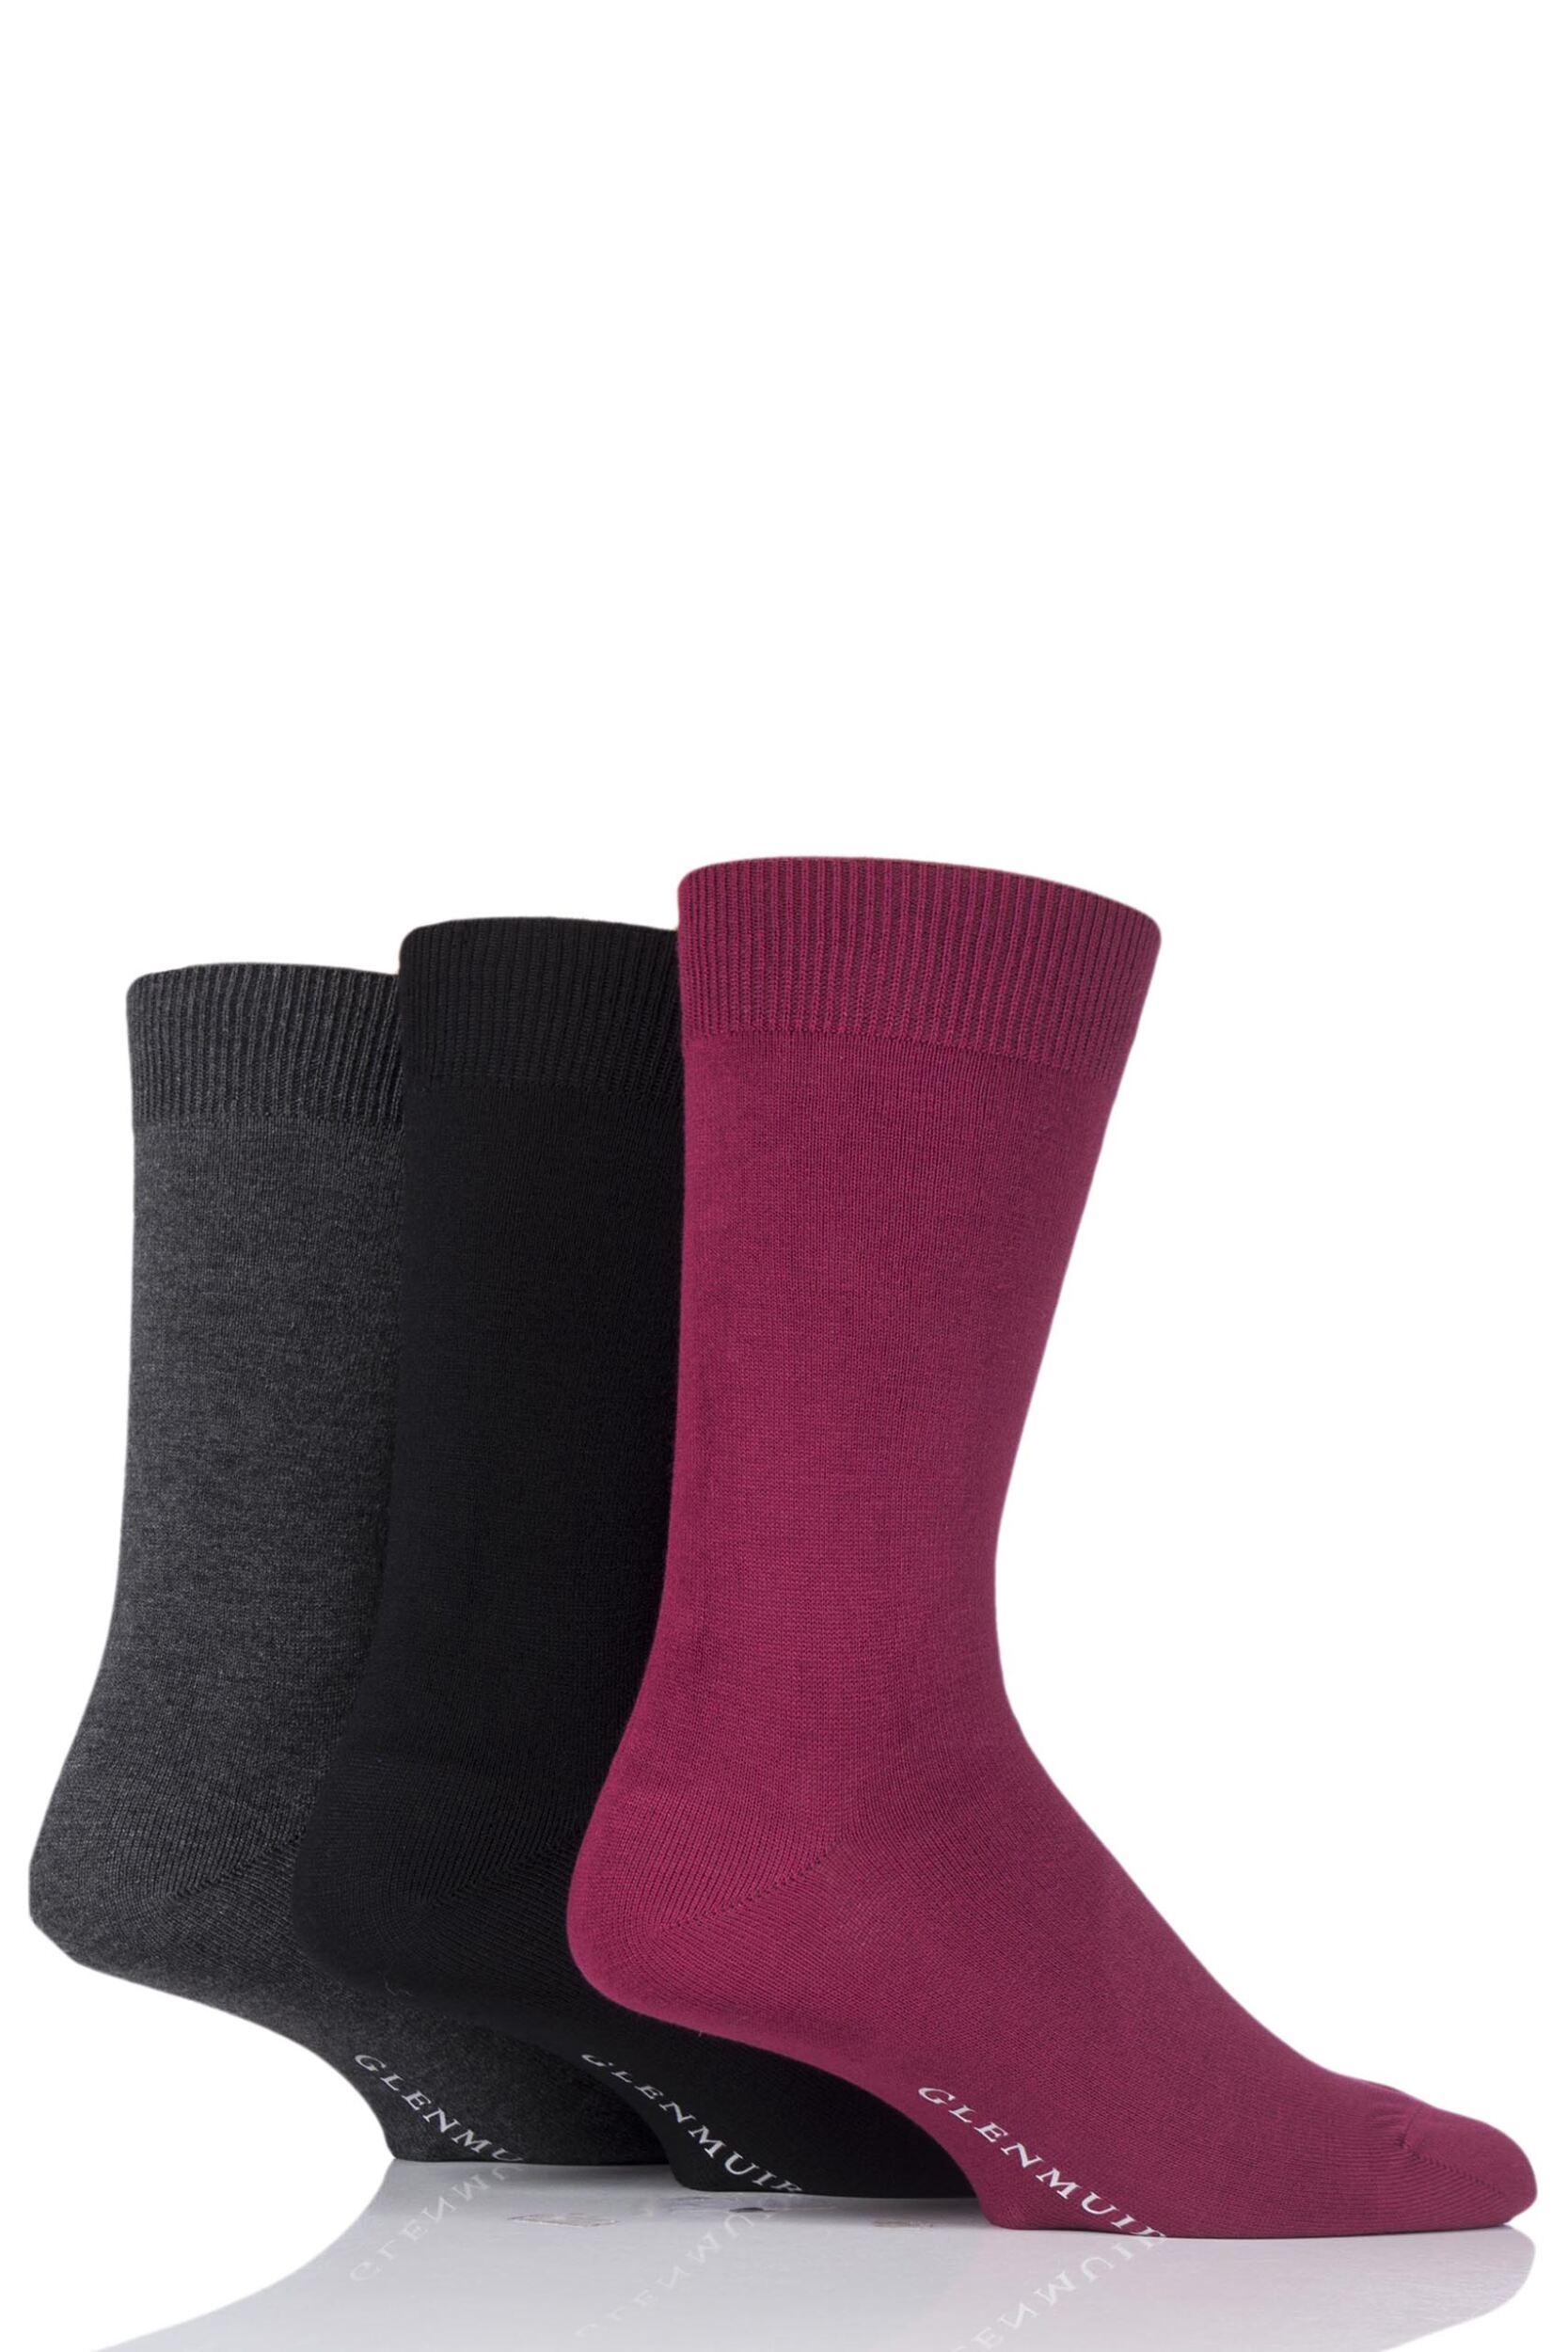 Men's Socks Mens 3 Pair Glenmuir Classic Bamboo Plain Socks